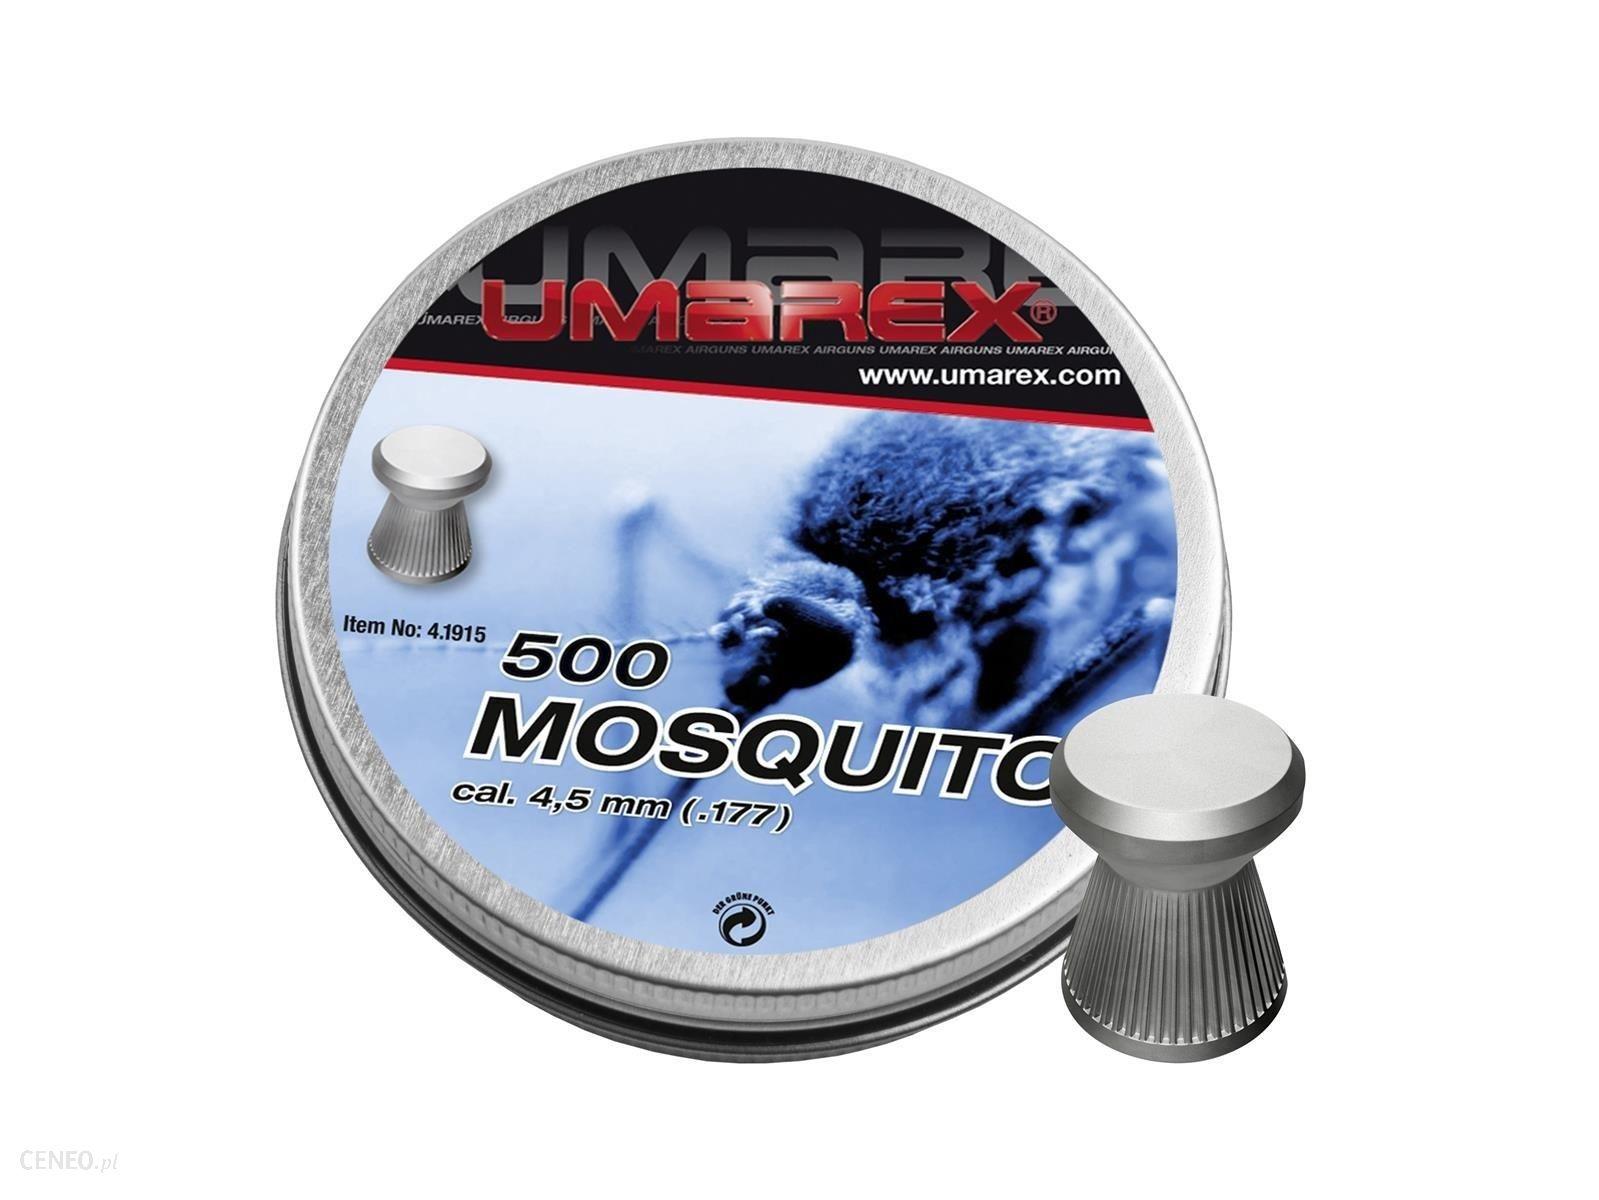 Umarex Śrut Diabolo Mosquito Ribbed 4